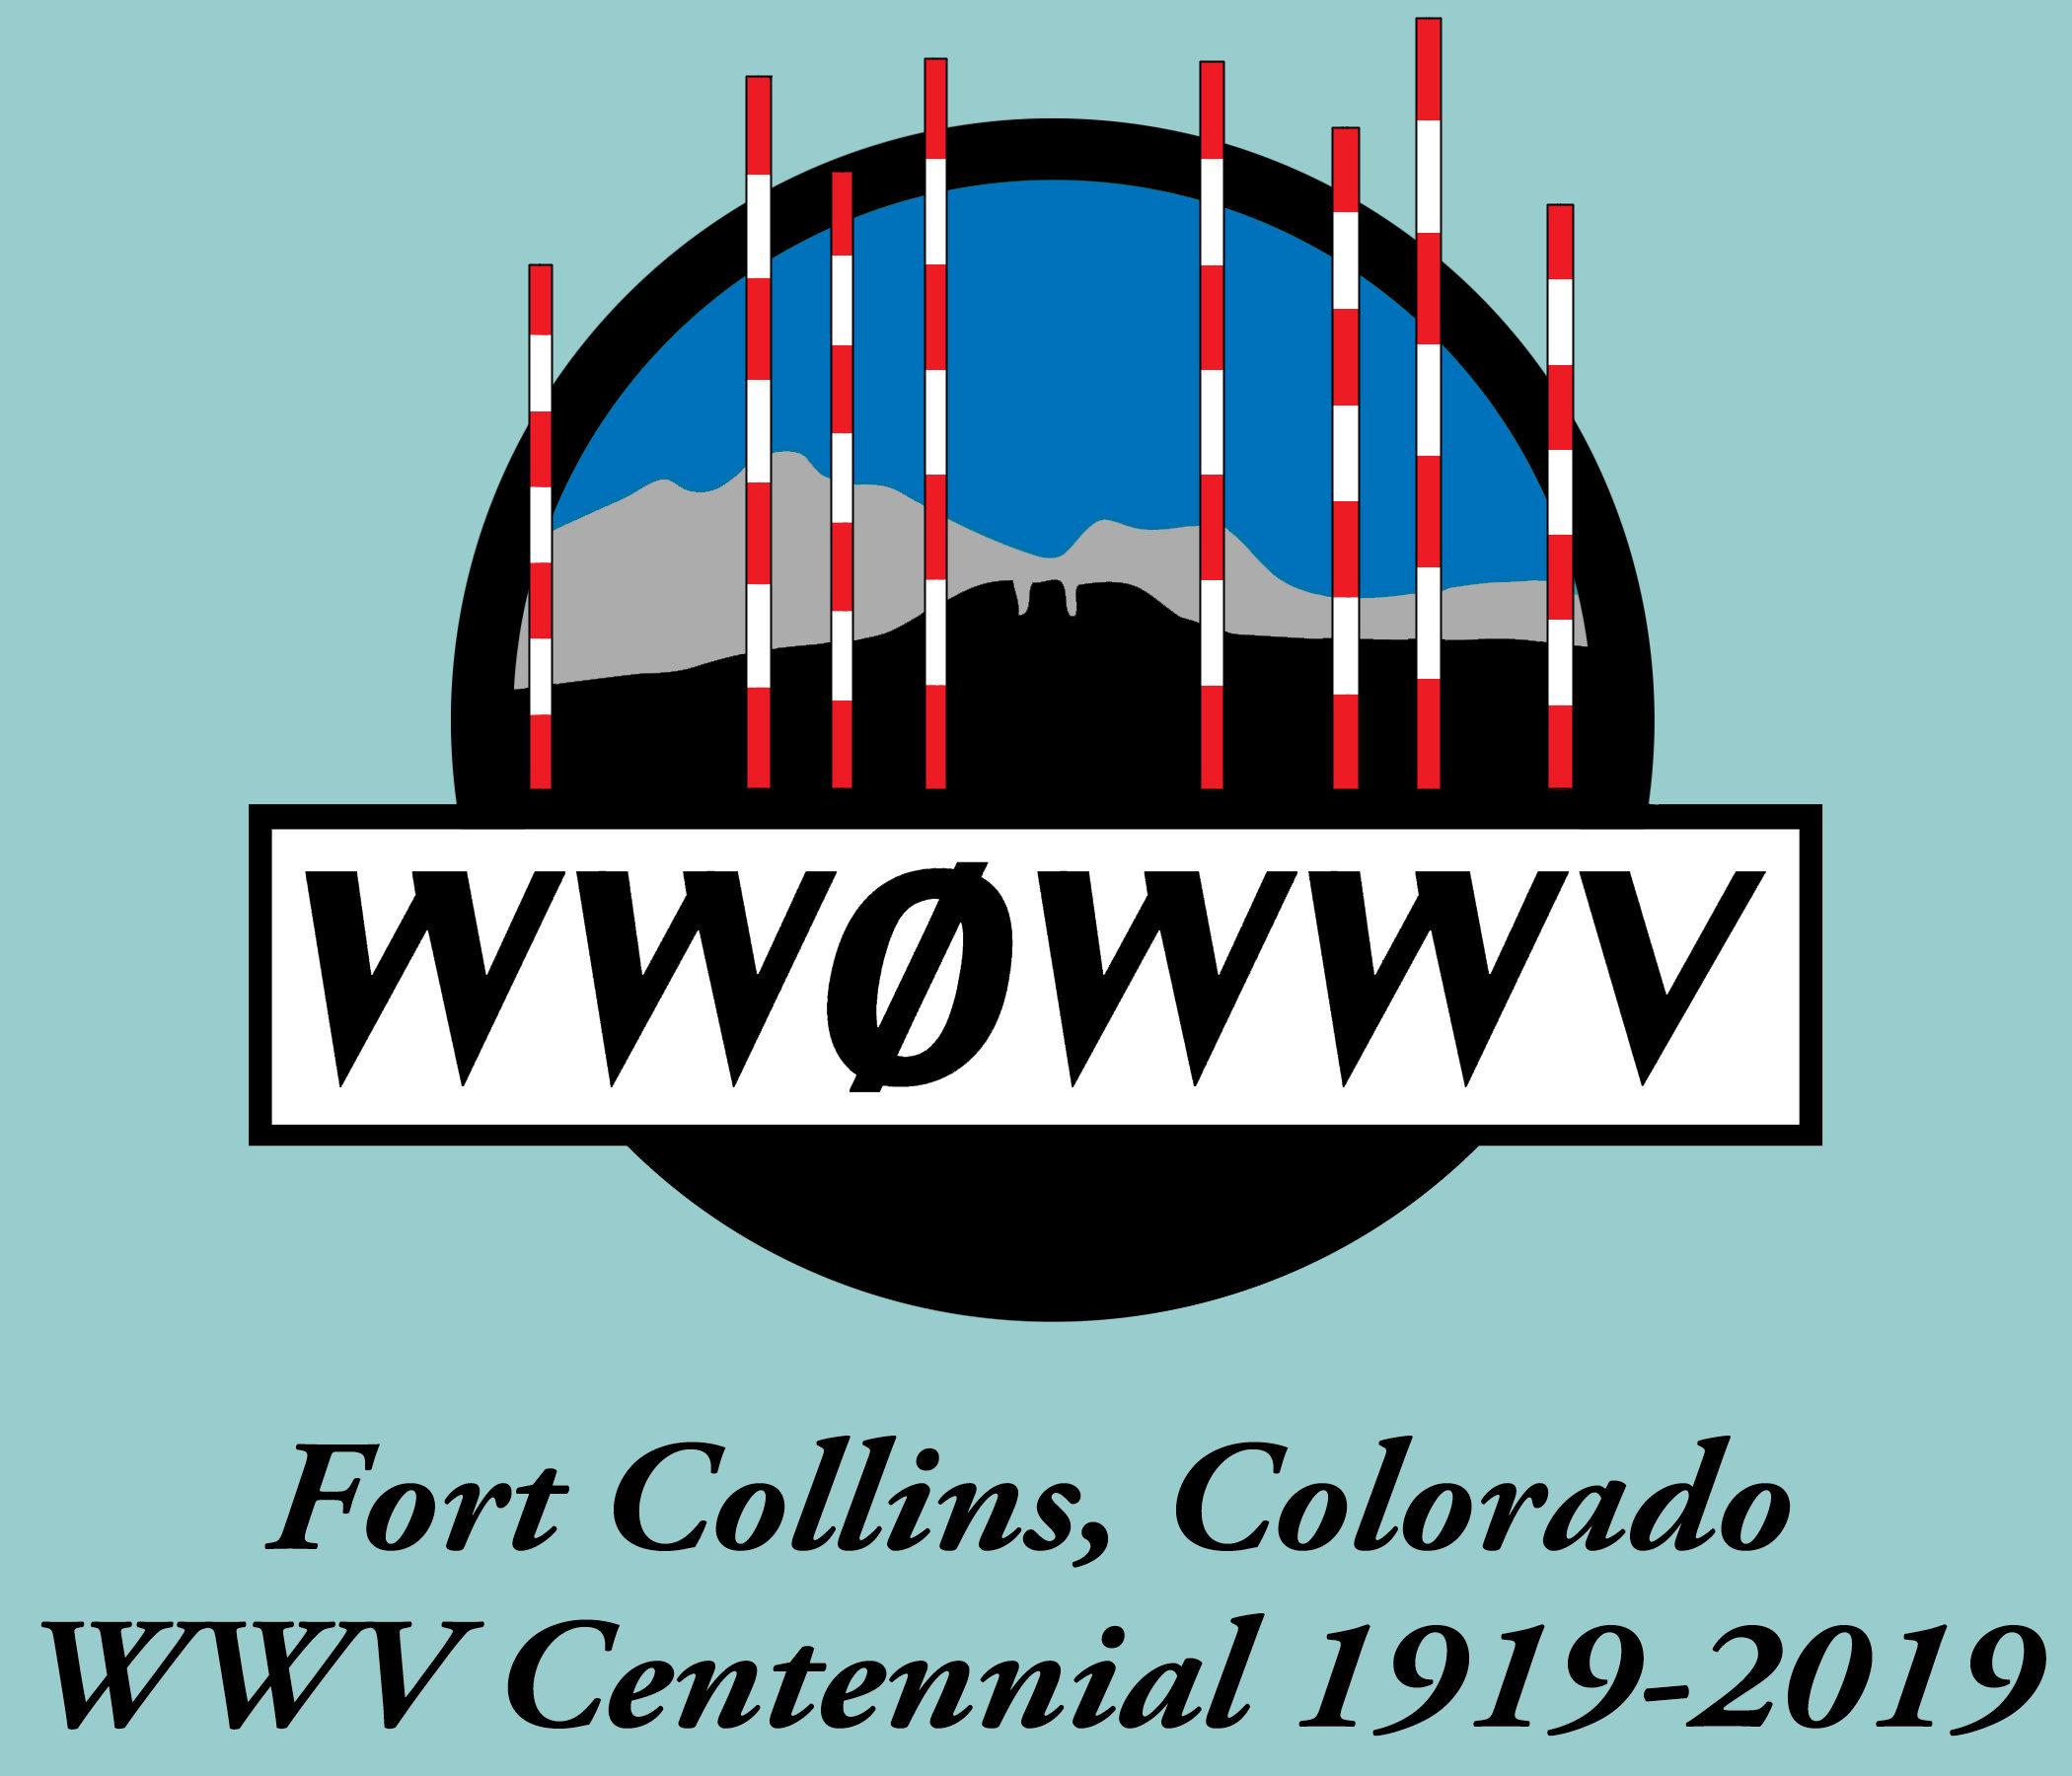 Trial Run for WW0WWV 100th Anniversary Special Event a Success.